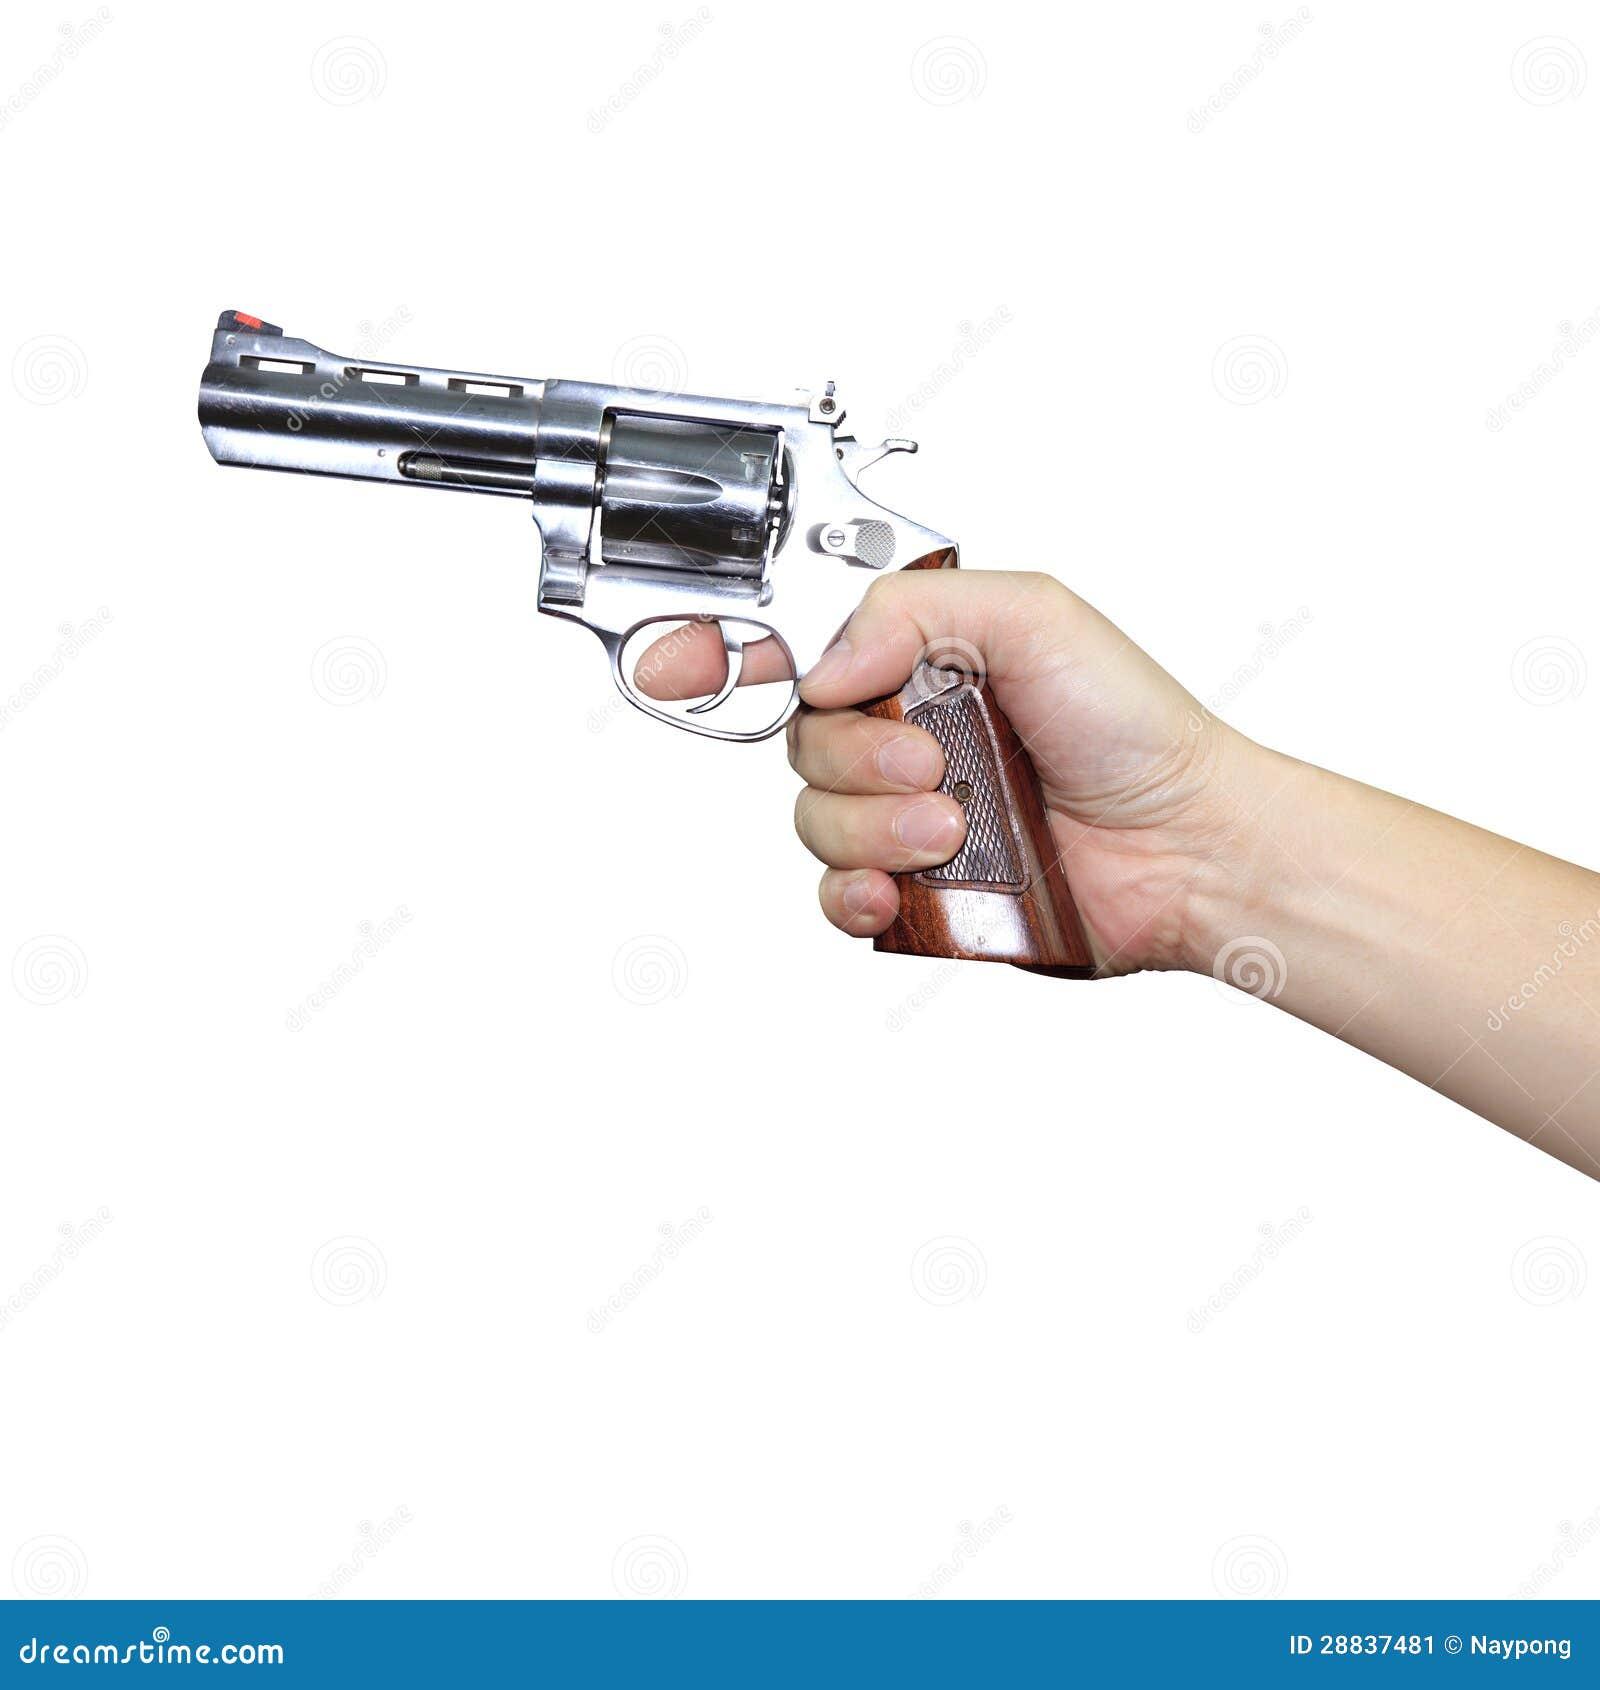 Hand Holding A Gun Stock Image - Image: 28837481